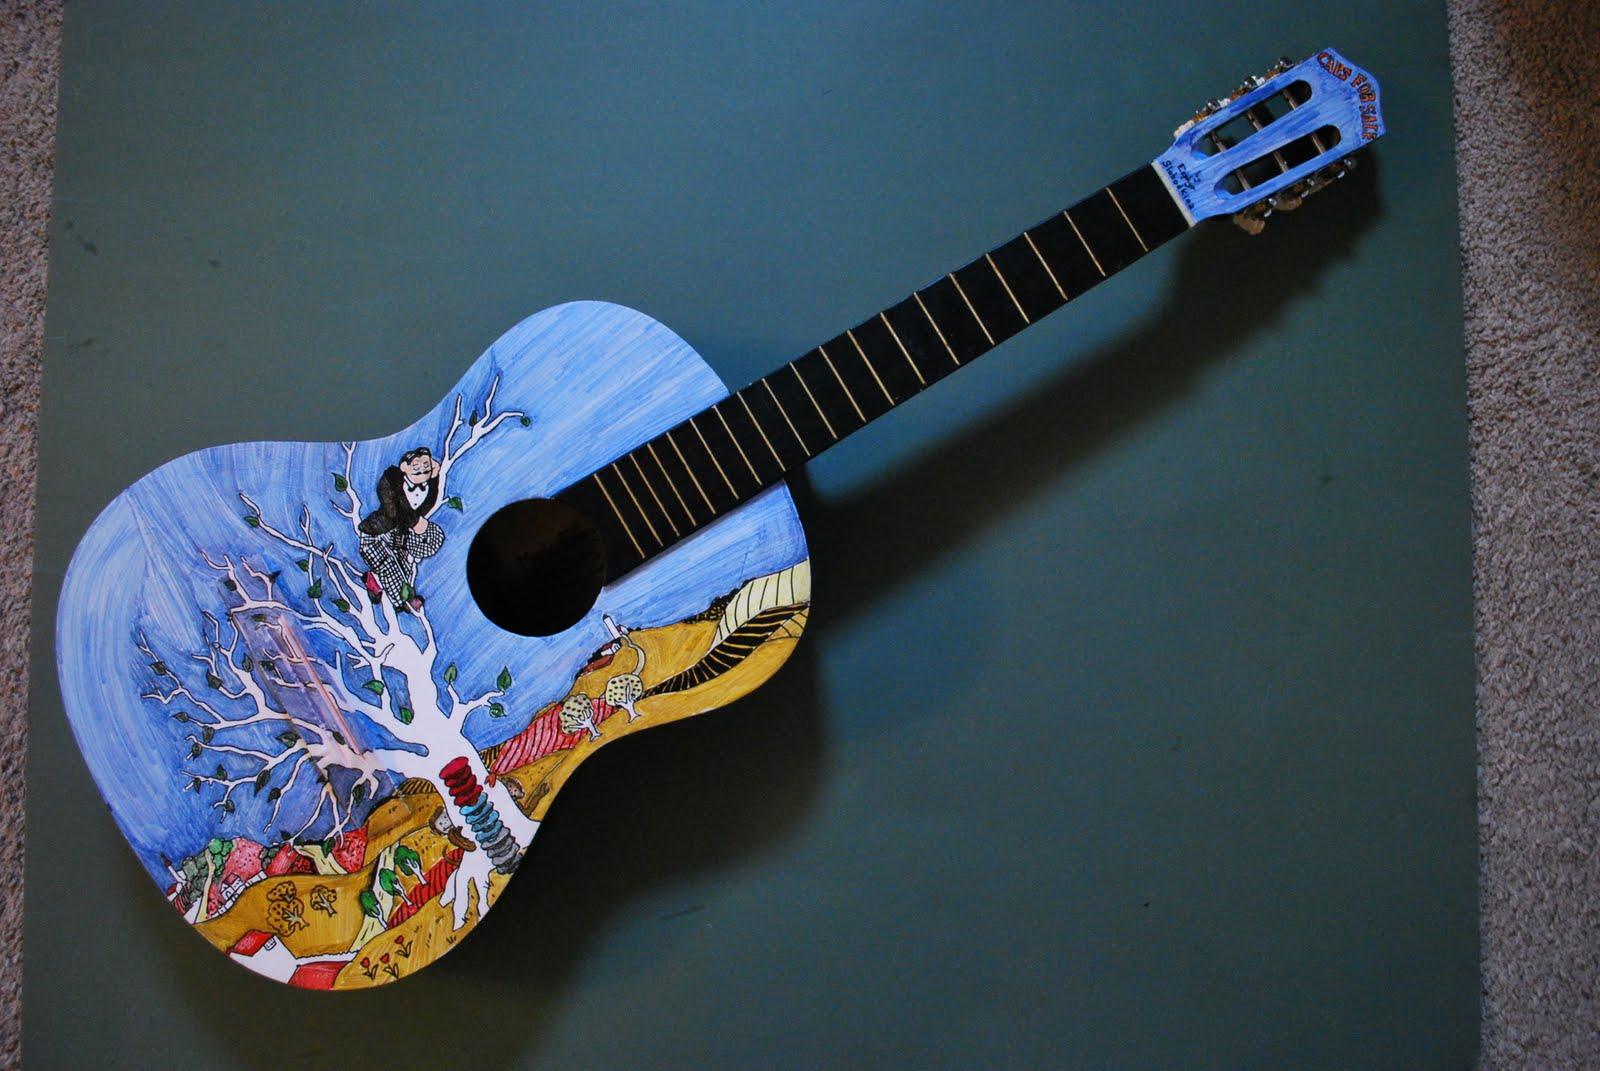 Guitar Designs Art : Guitar design mark fraley art